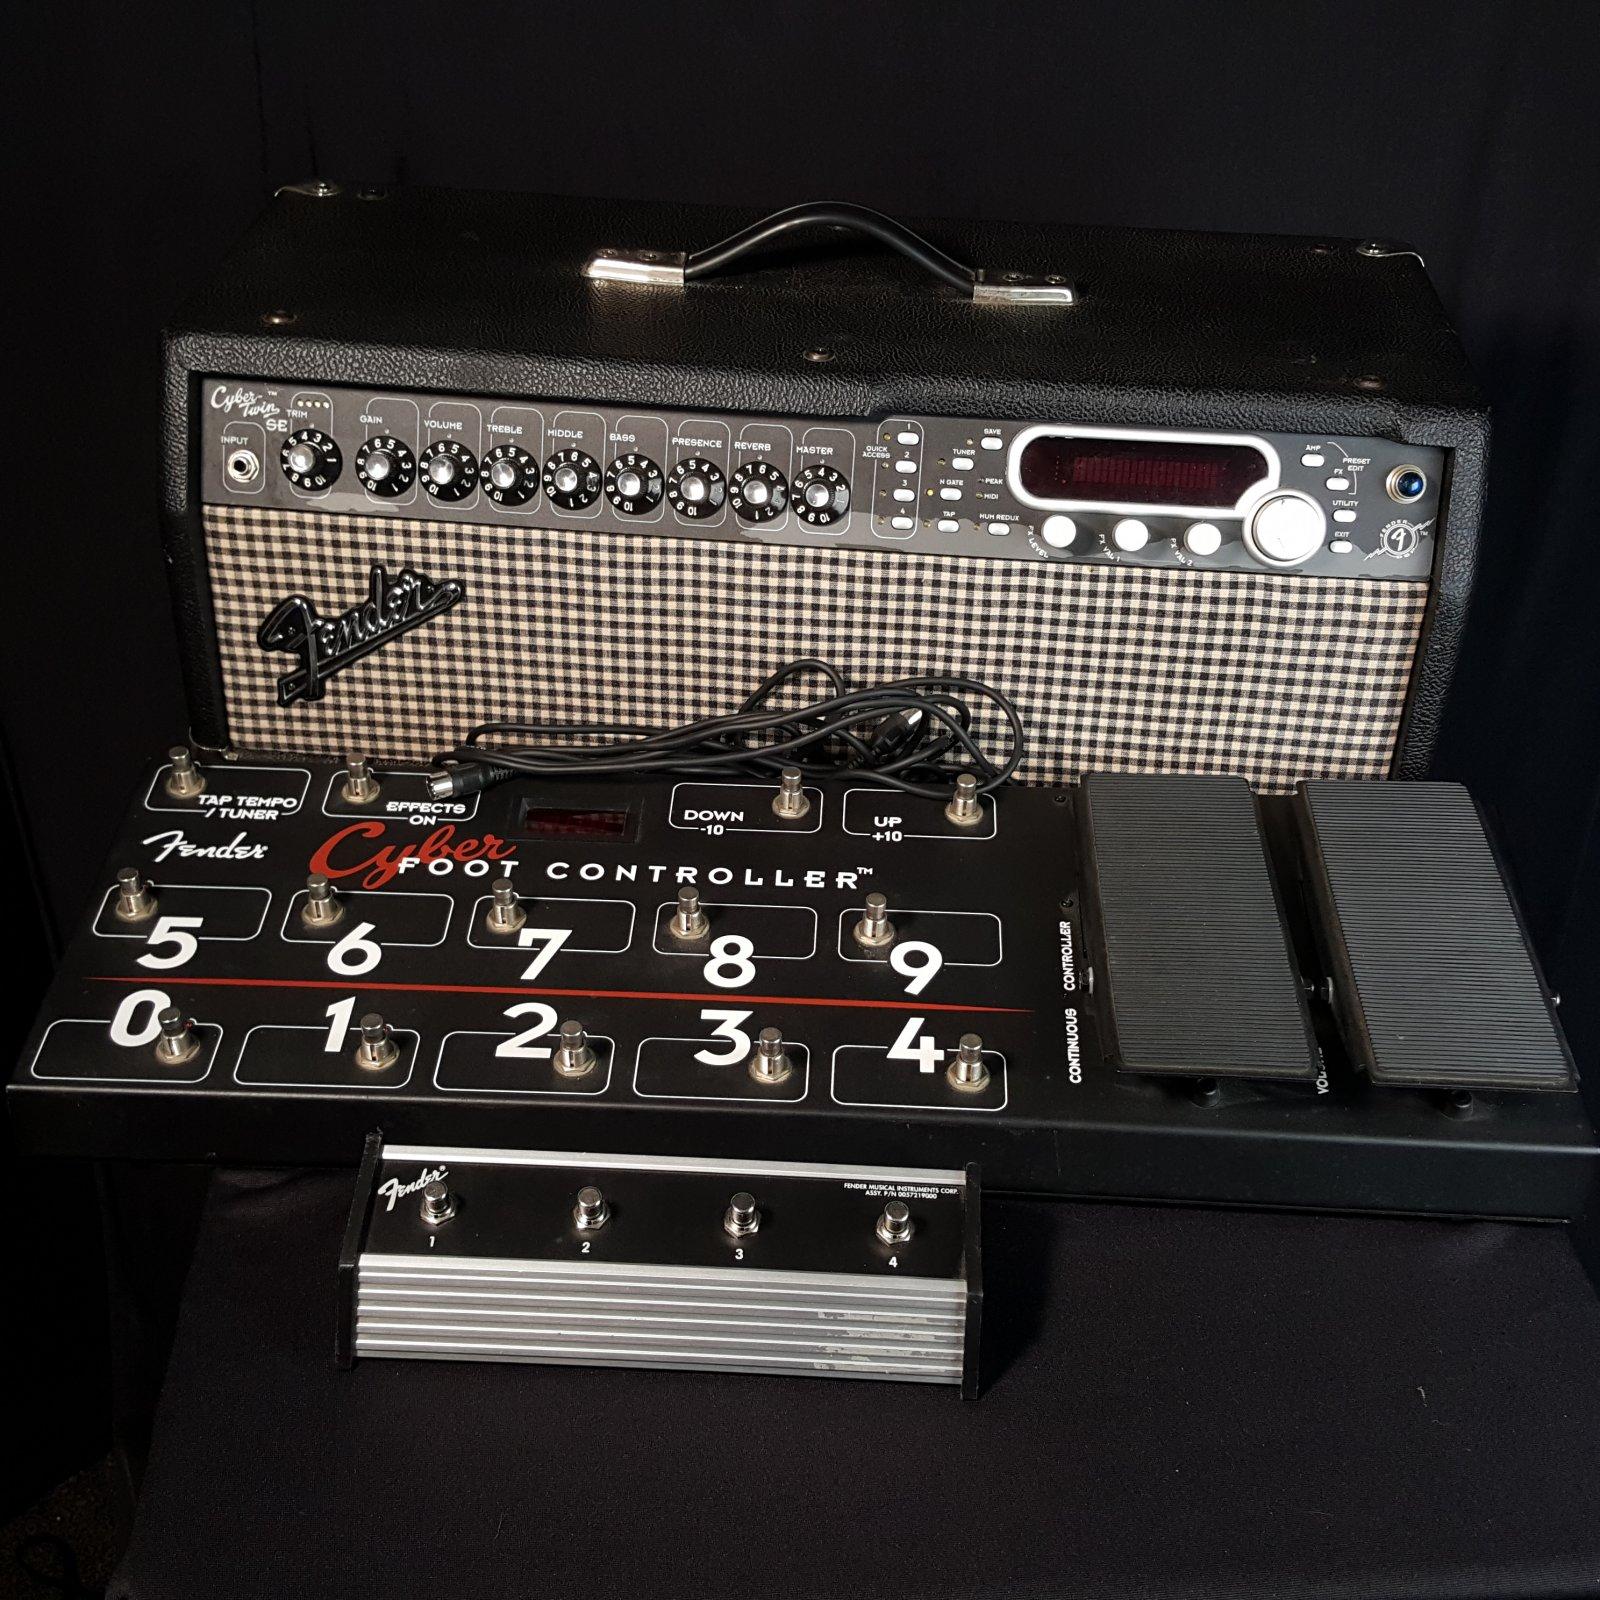 Used Fender Cyber Twin SE Head w/ Footswitch & Foot Controller